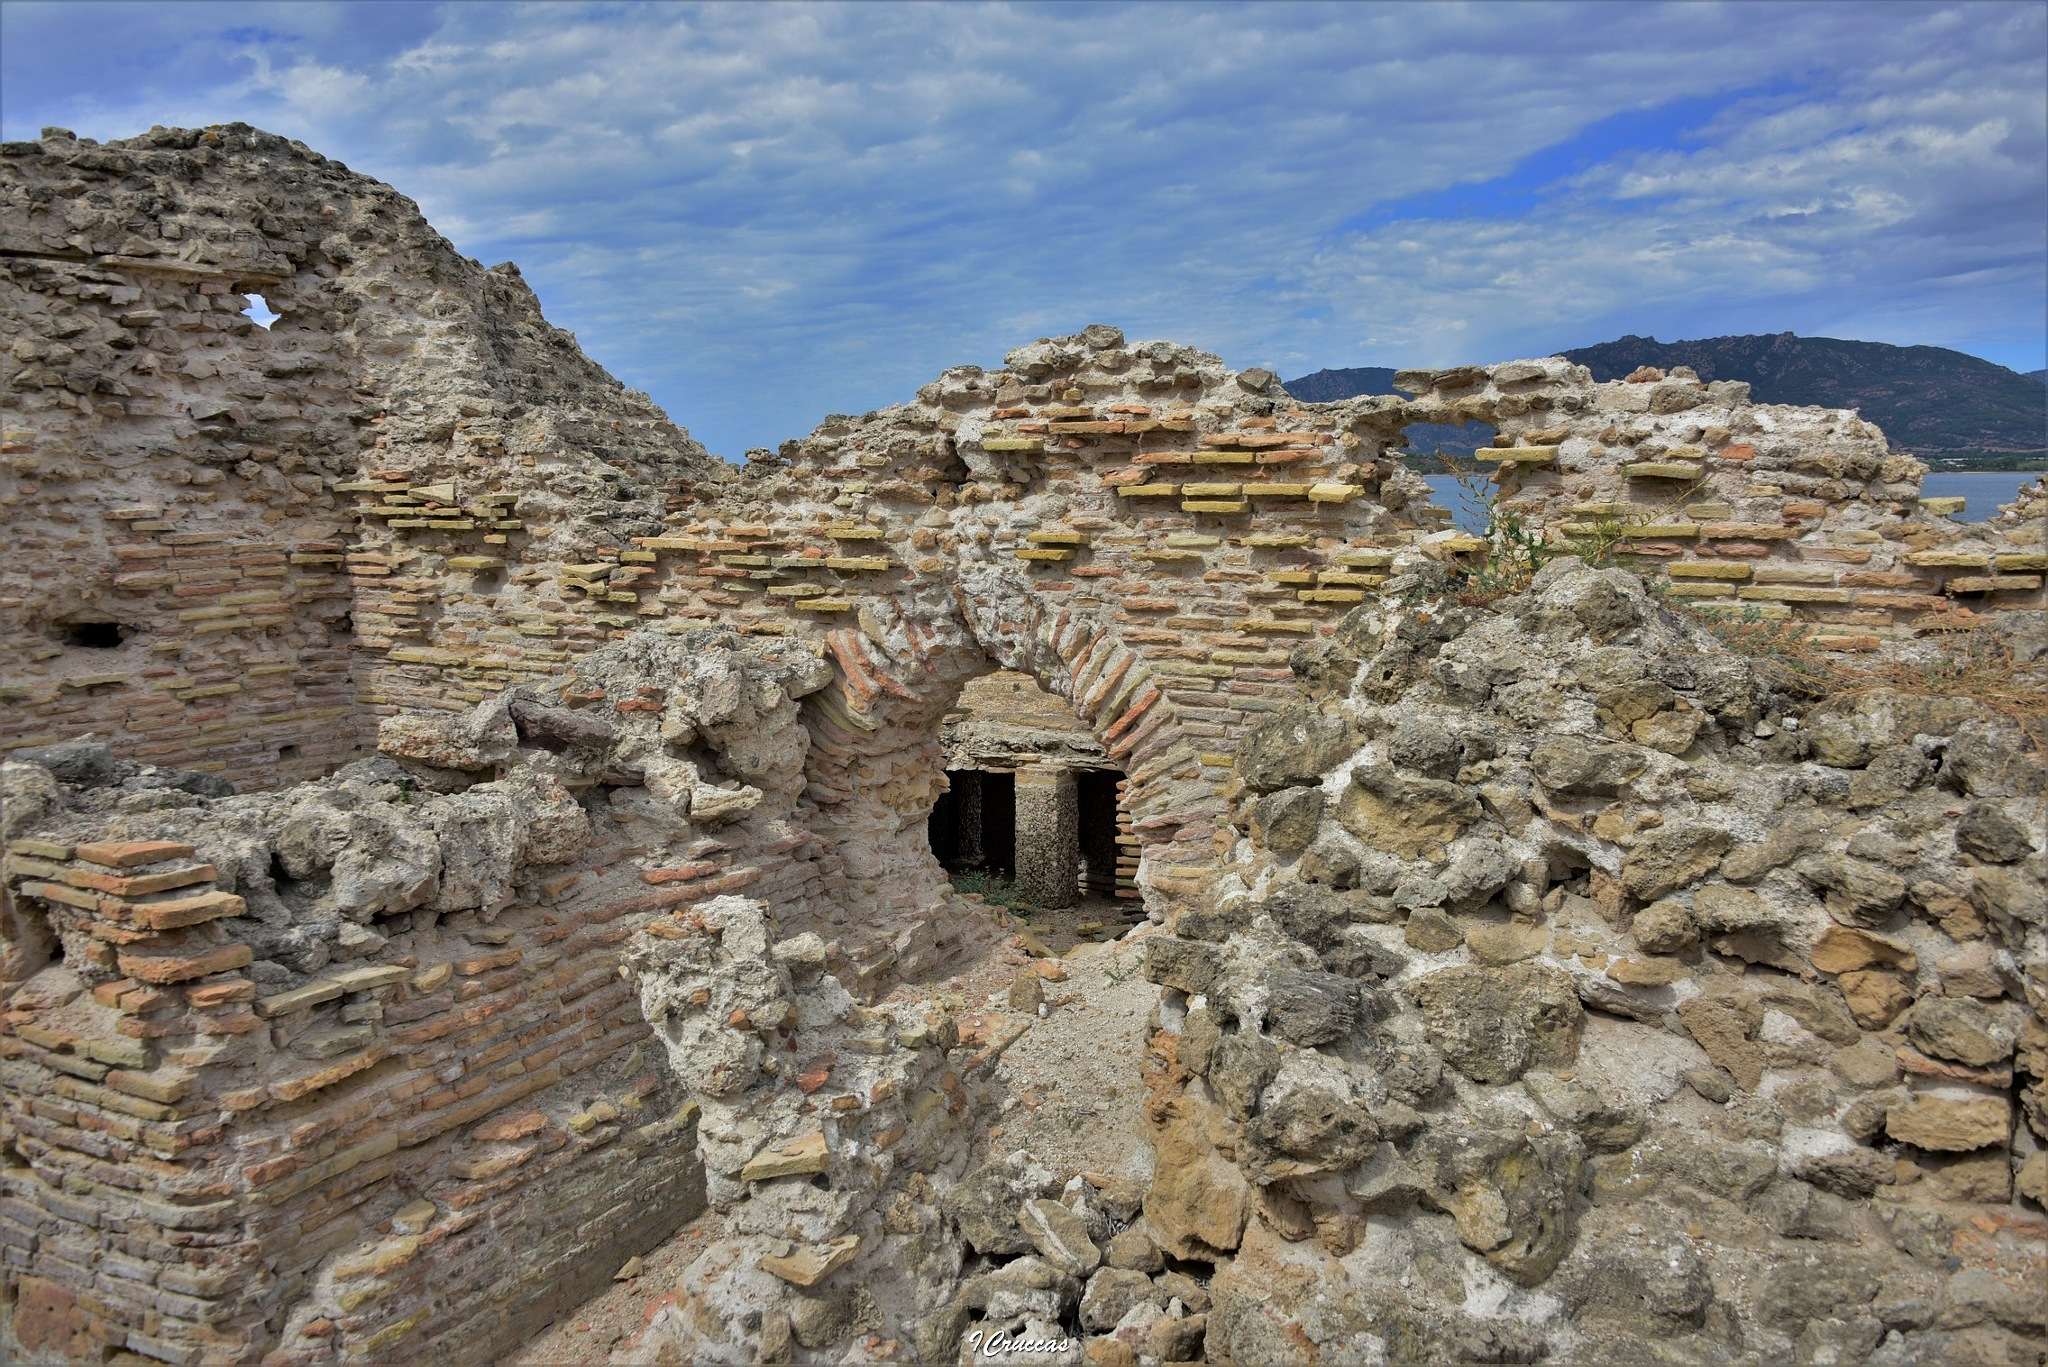 Nora Sardinia Italy: Ruins Roman Baths by ignazio cruccas